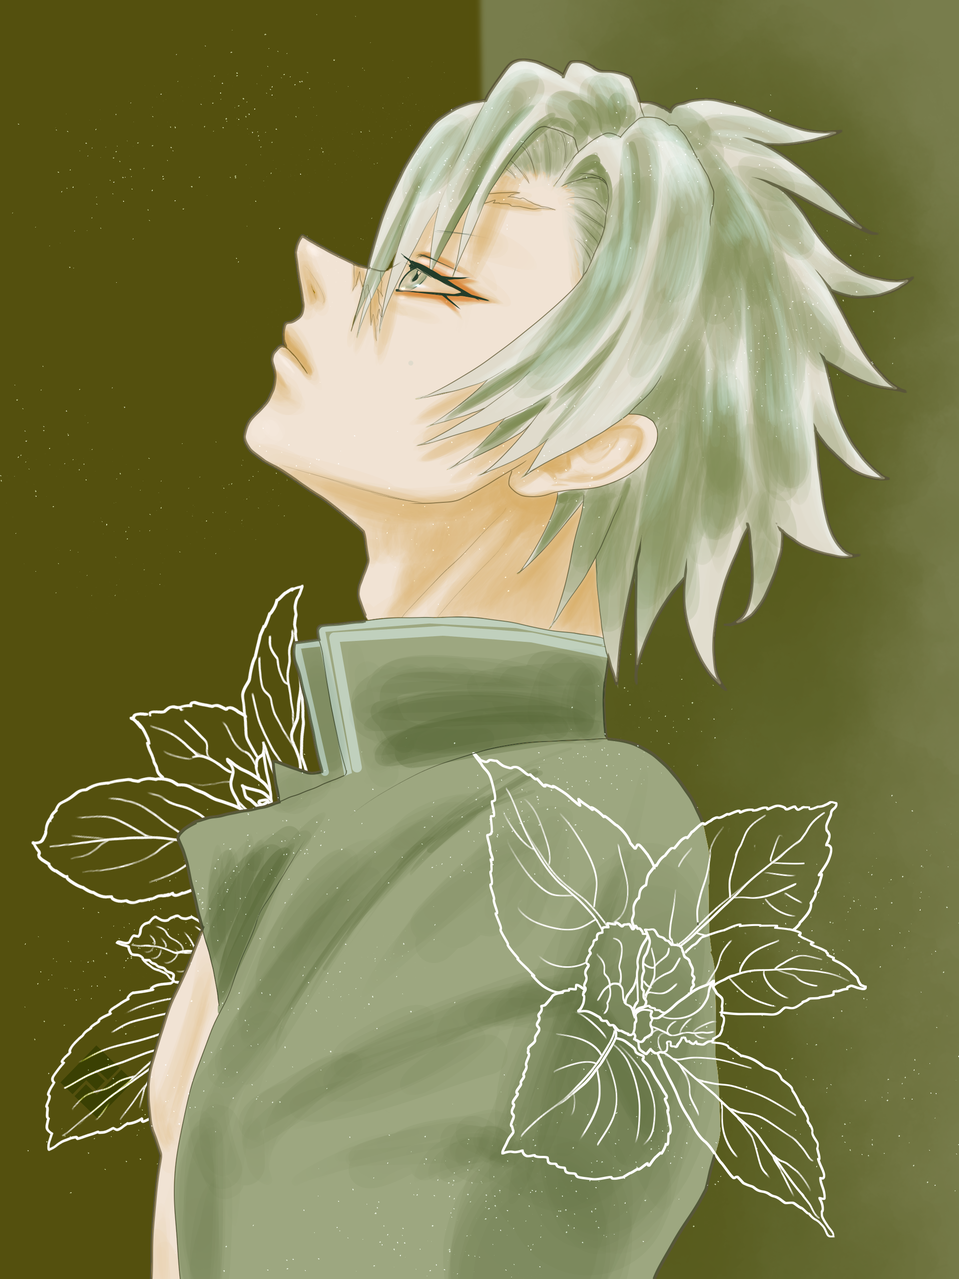 Illust of FJ green fanart KimetsunoYaiba boy ShinazugawaSanemi